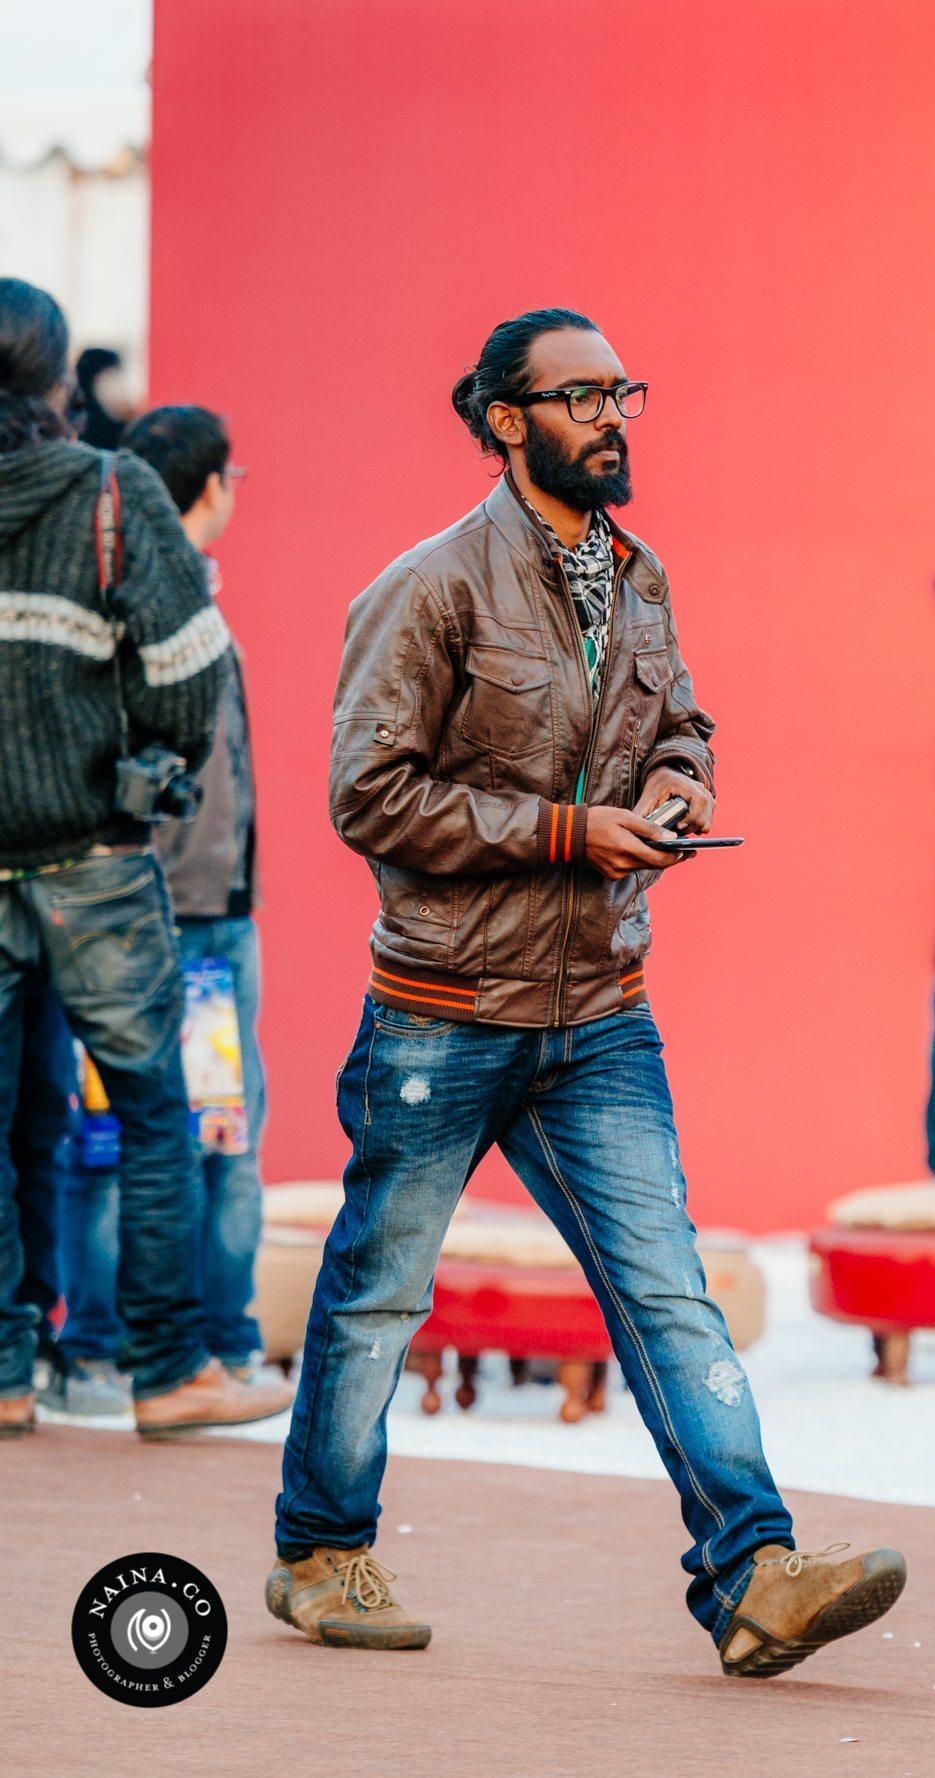 Naina.co-Raconteuse-Visuelle-Photographer-Blogger-Storyteller-Luxury-Lifestyle-January-2015-Le-Meridien-India-Art-Fair-Coffee-EyesForStreetSstyle-09